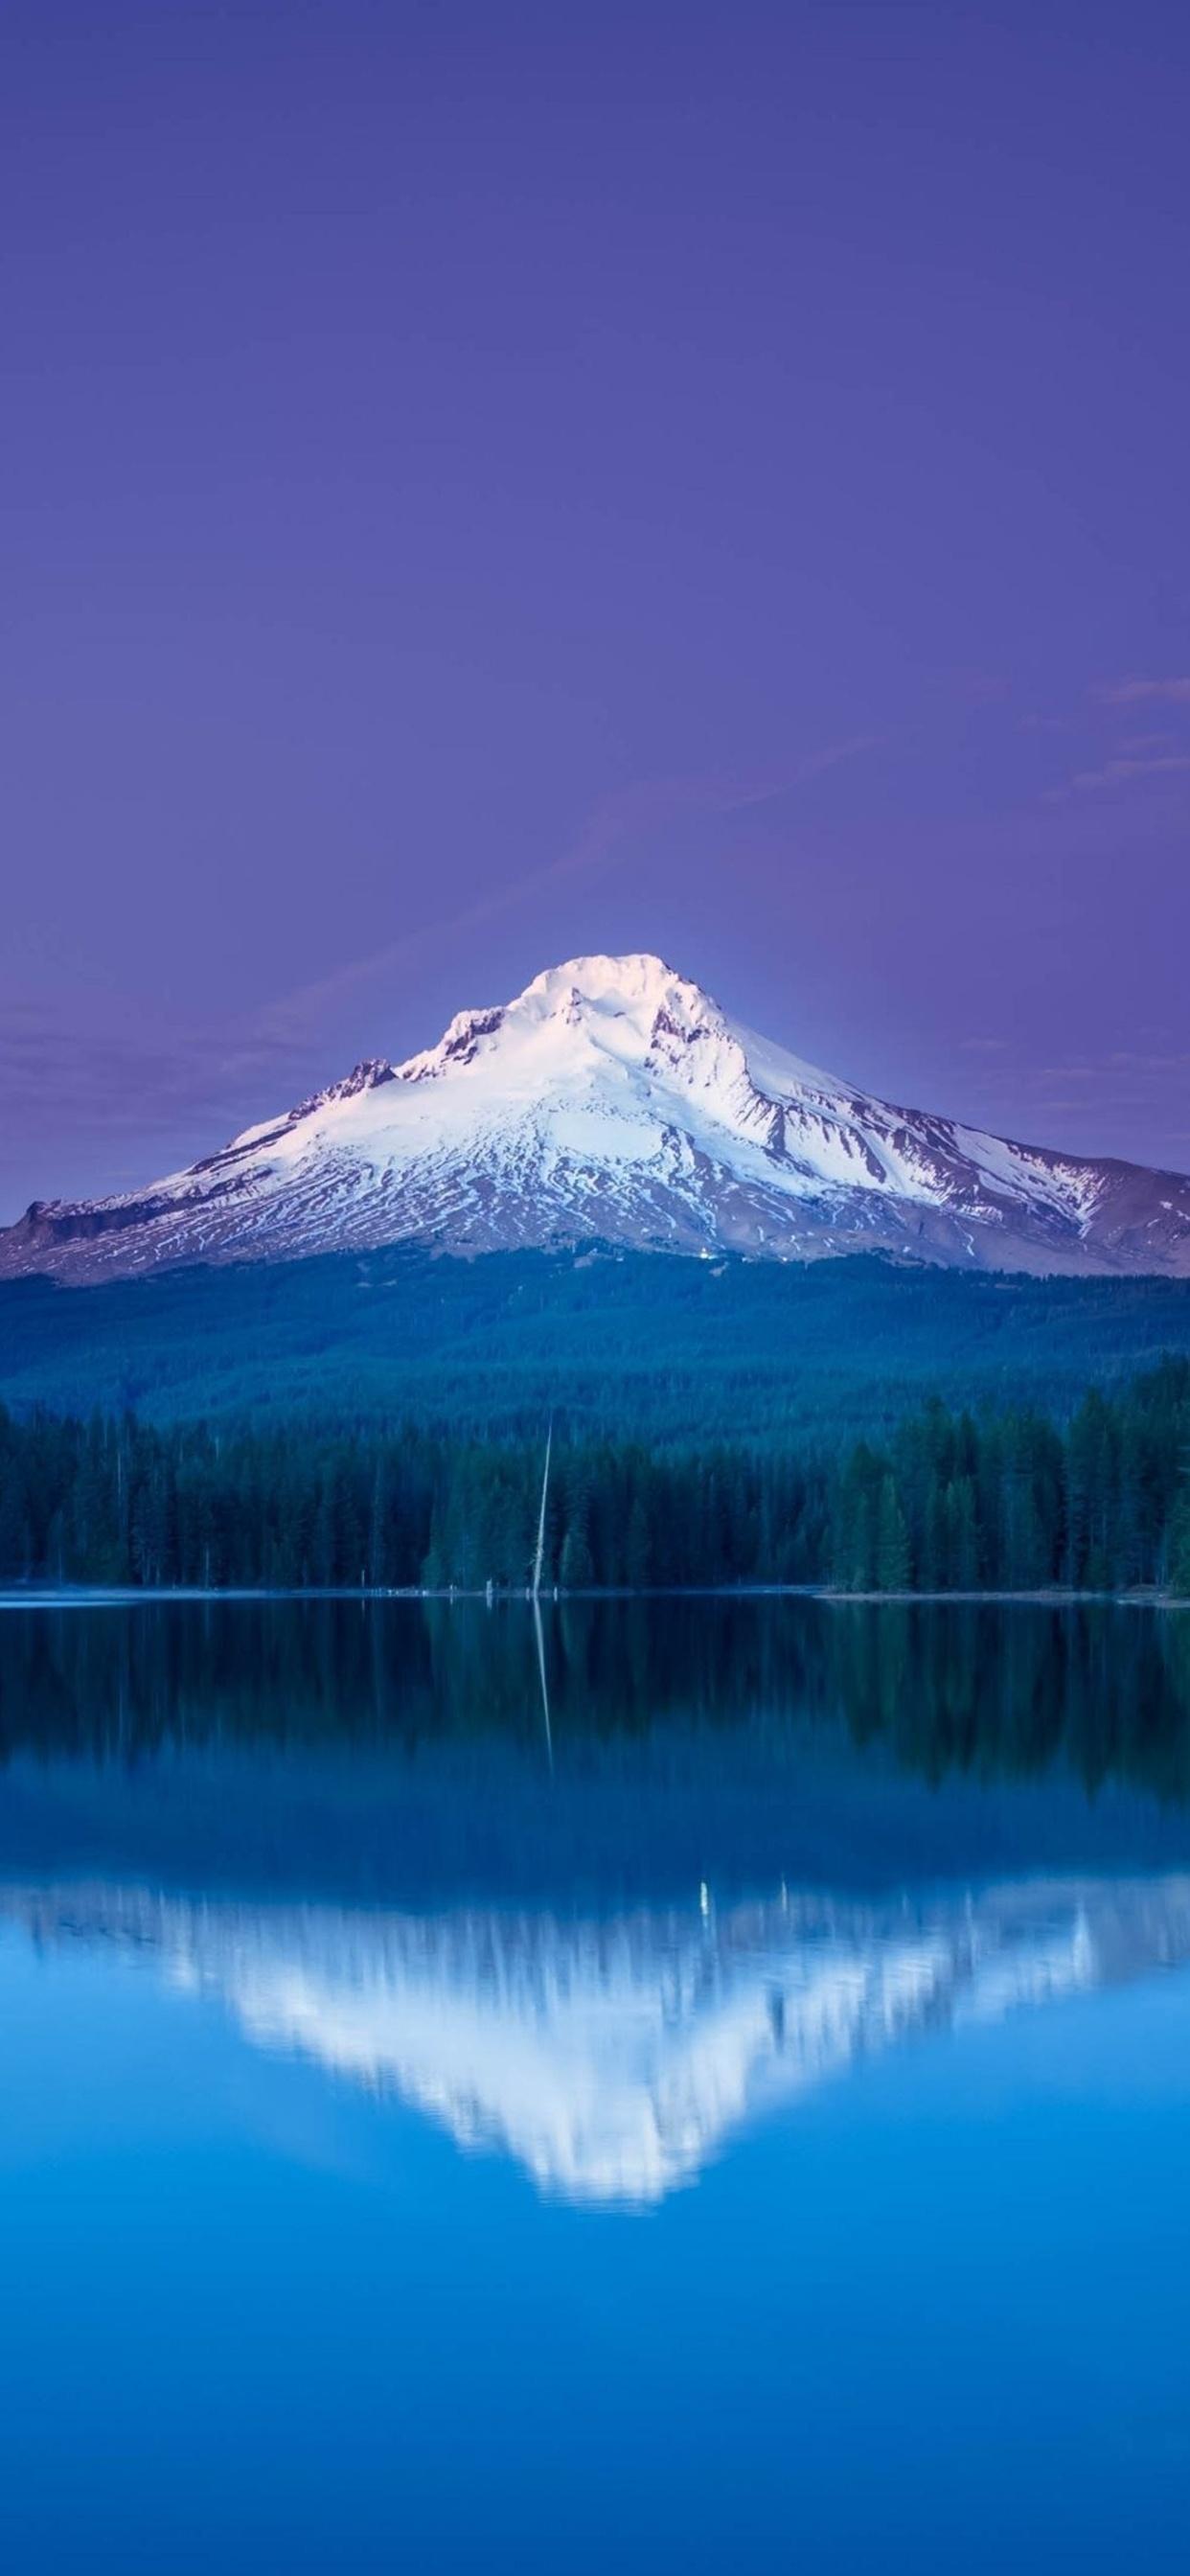 1242x2688 Landscape Lake Mountains 4k Iphone Xs Max Hd 4k Wallpapers